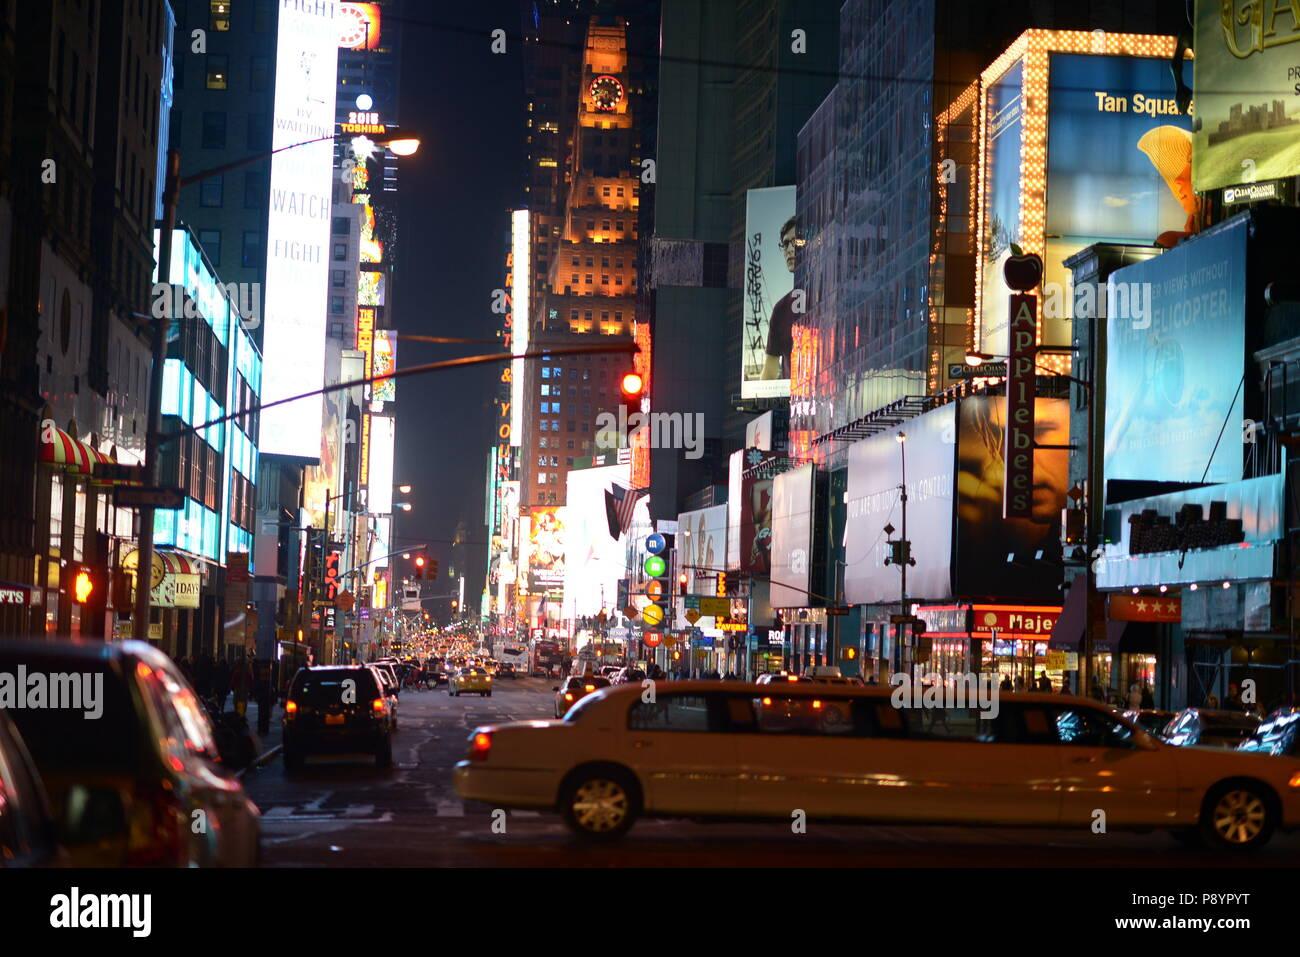 New York Times Square bei Nacht, am besten Times Square Foto Stockbild